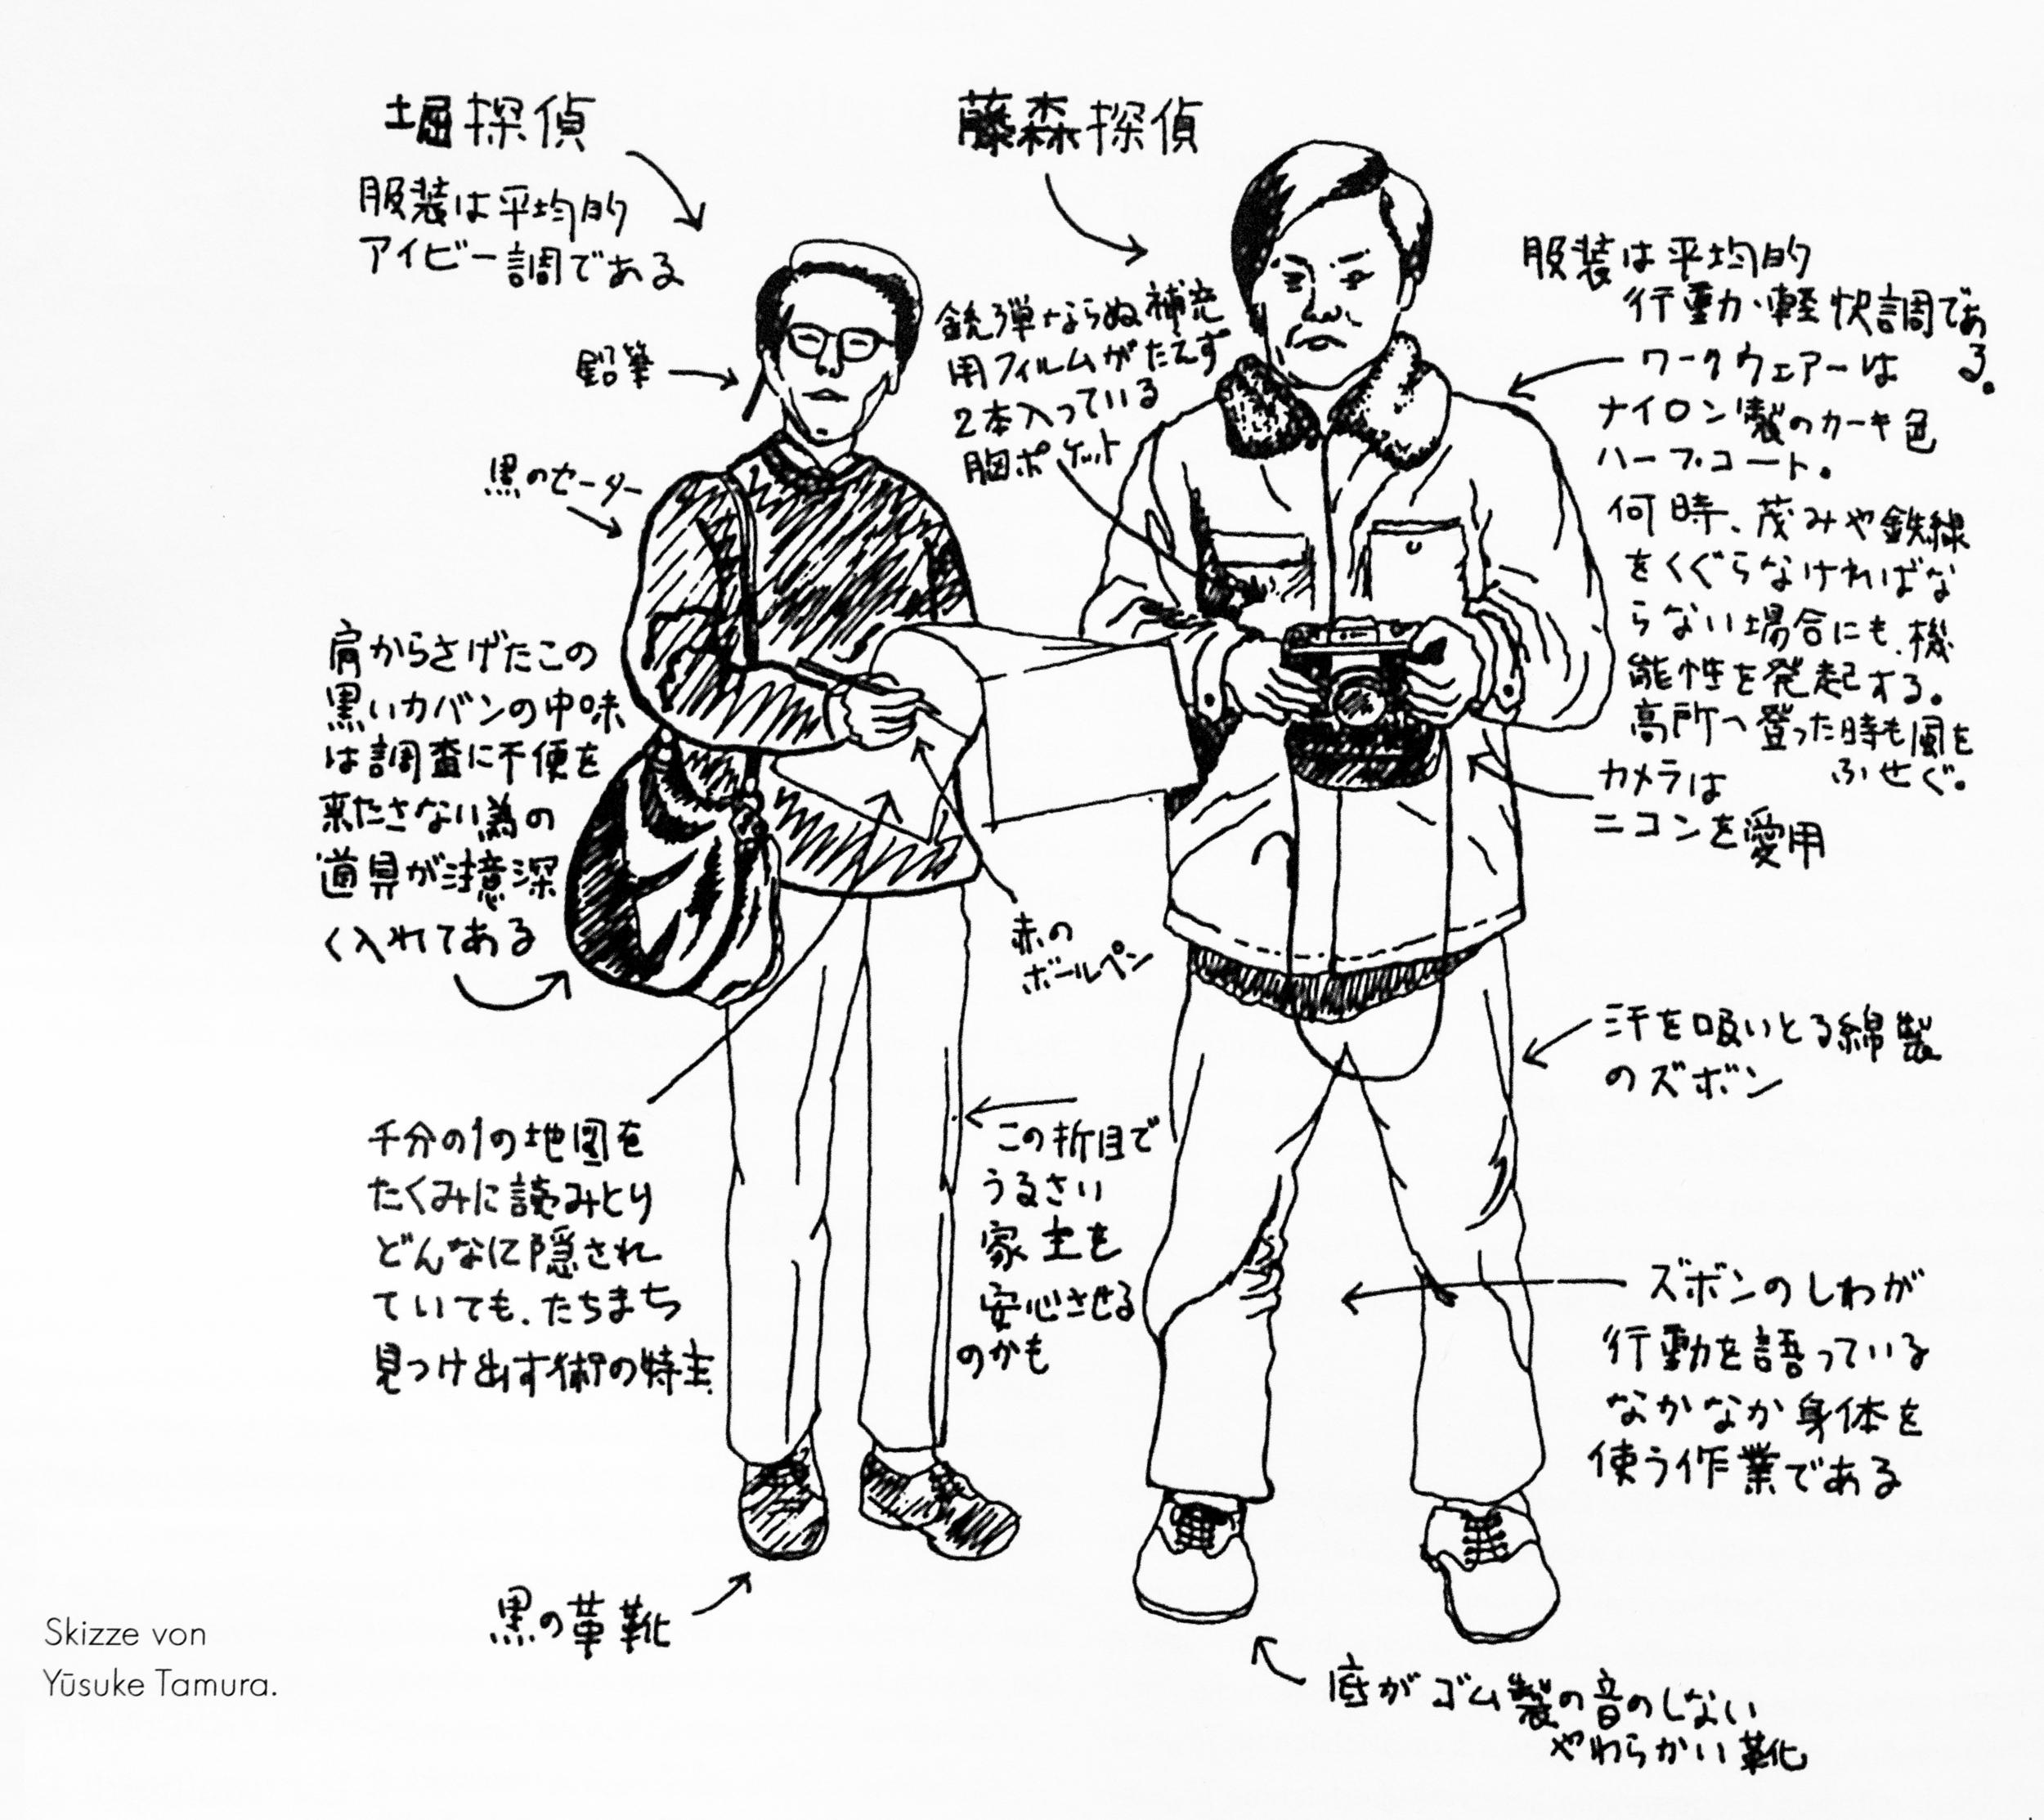 skizze japan flaneur.jpg